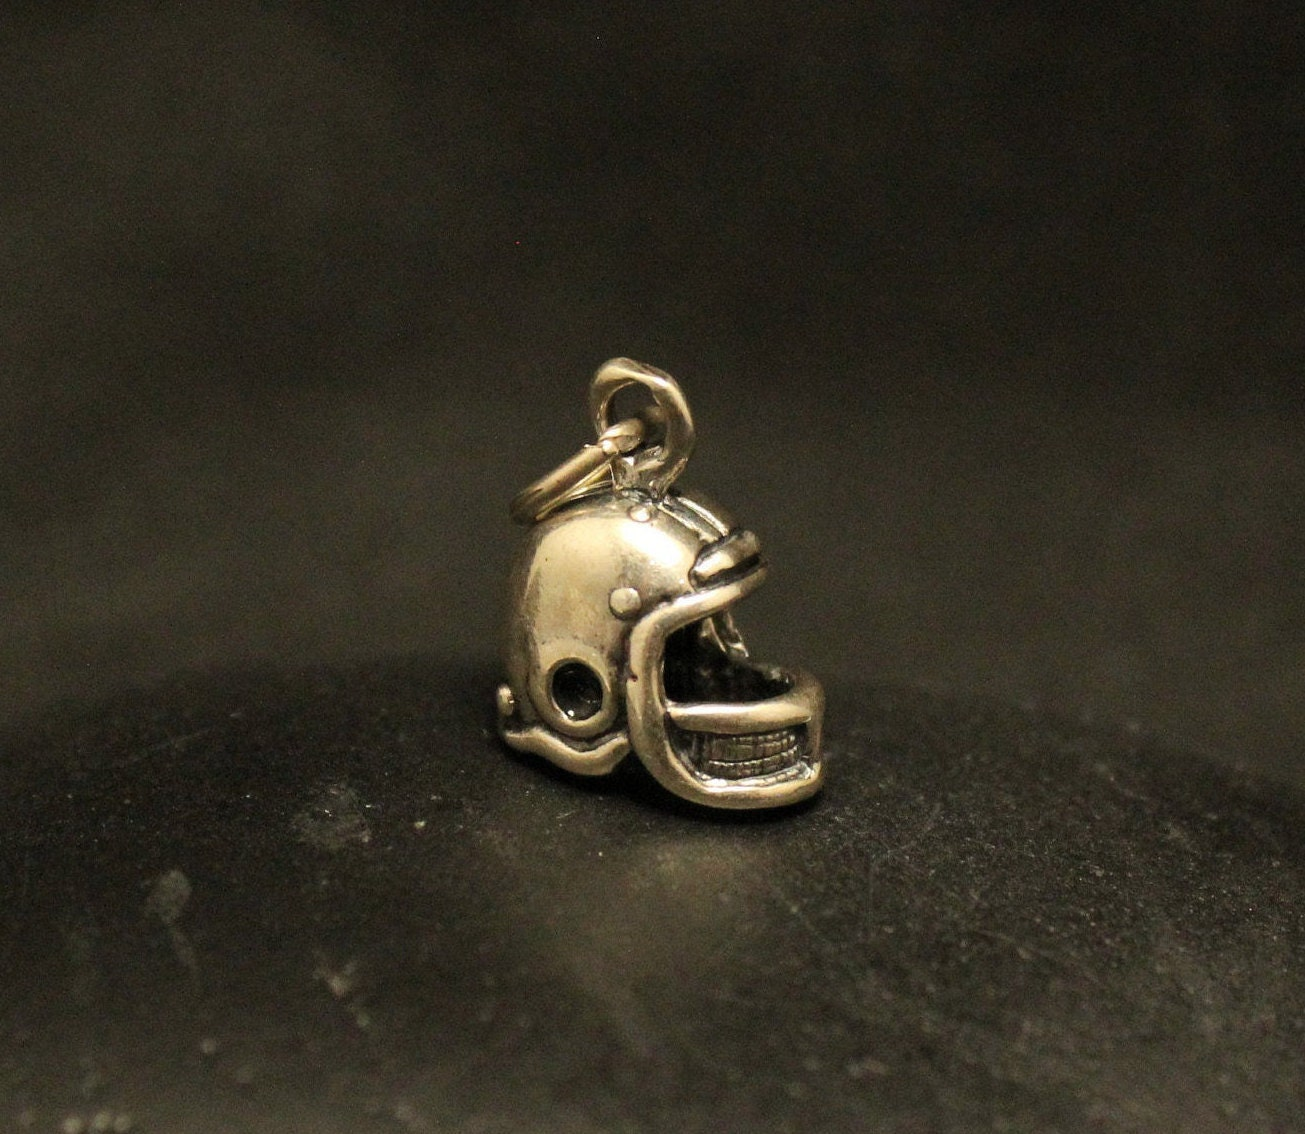 Football Helmet Sterling Silver Vintage Charm For Bracelet